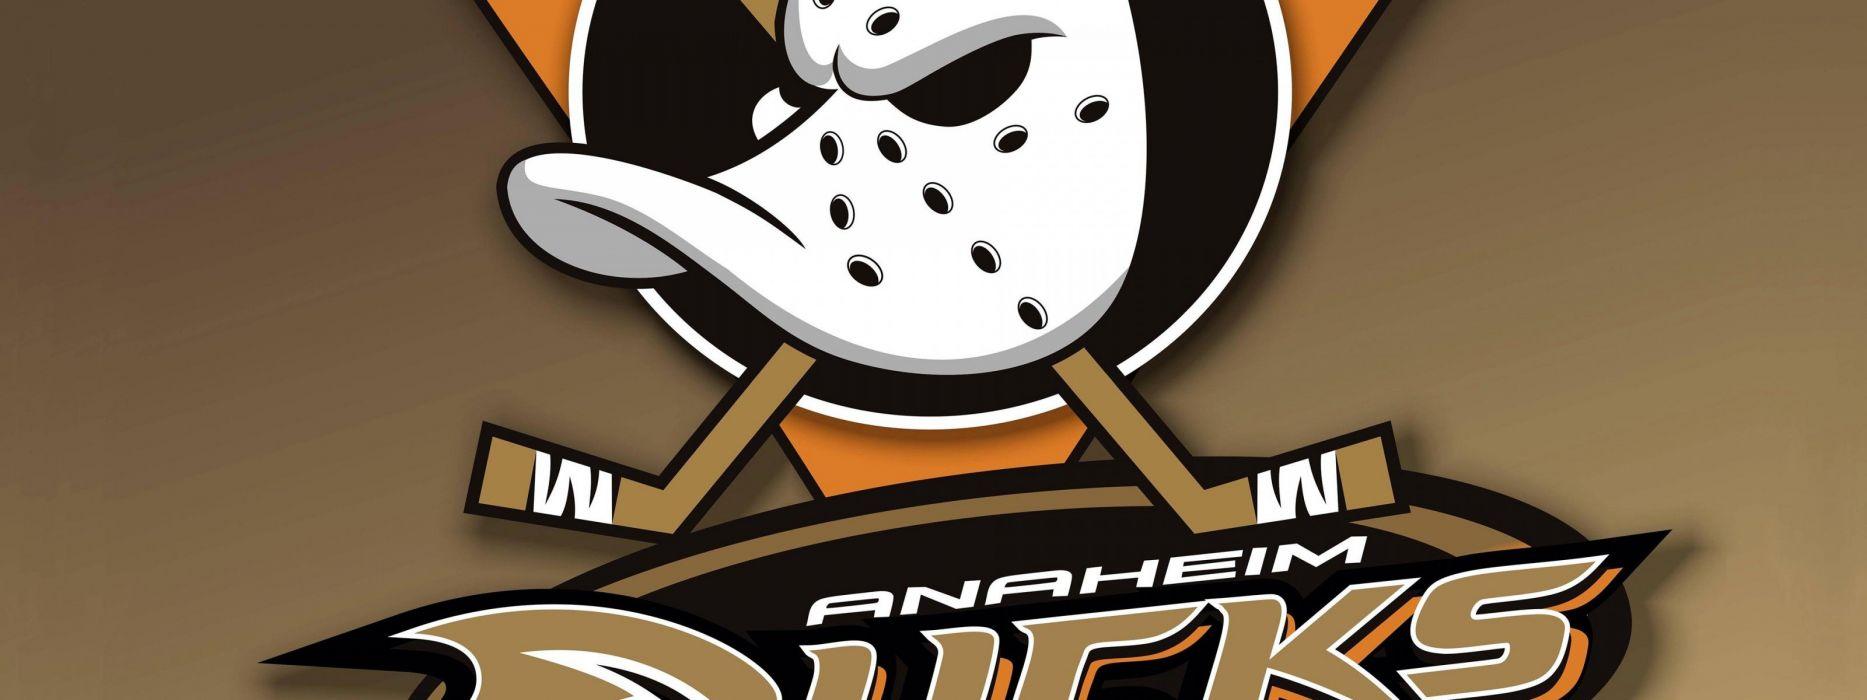 ANAHEIM DUCKS nhl hockey (5) wallpaper